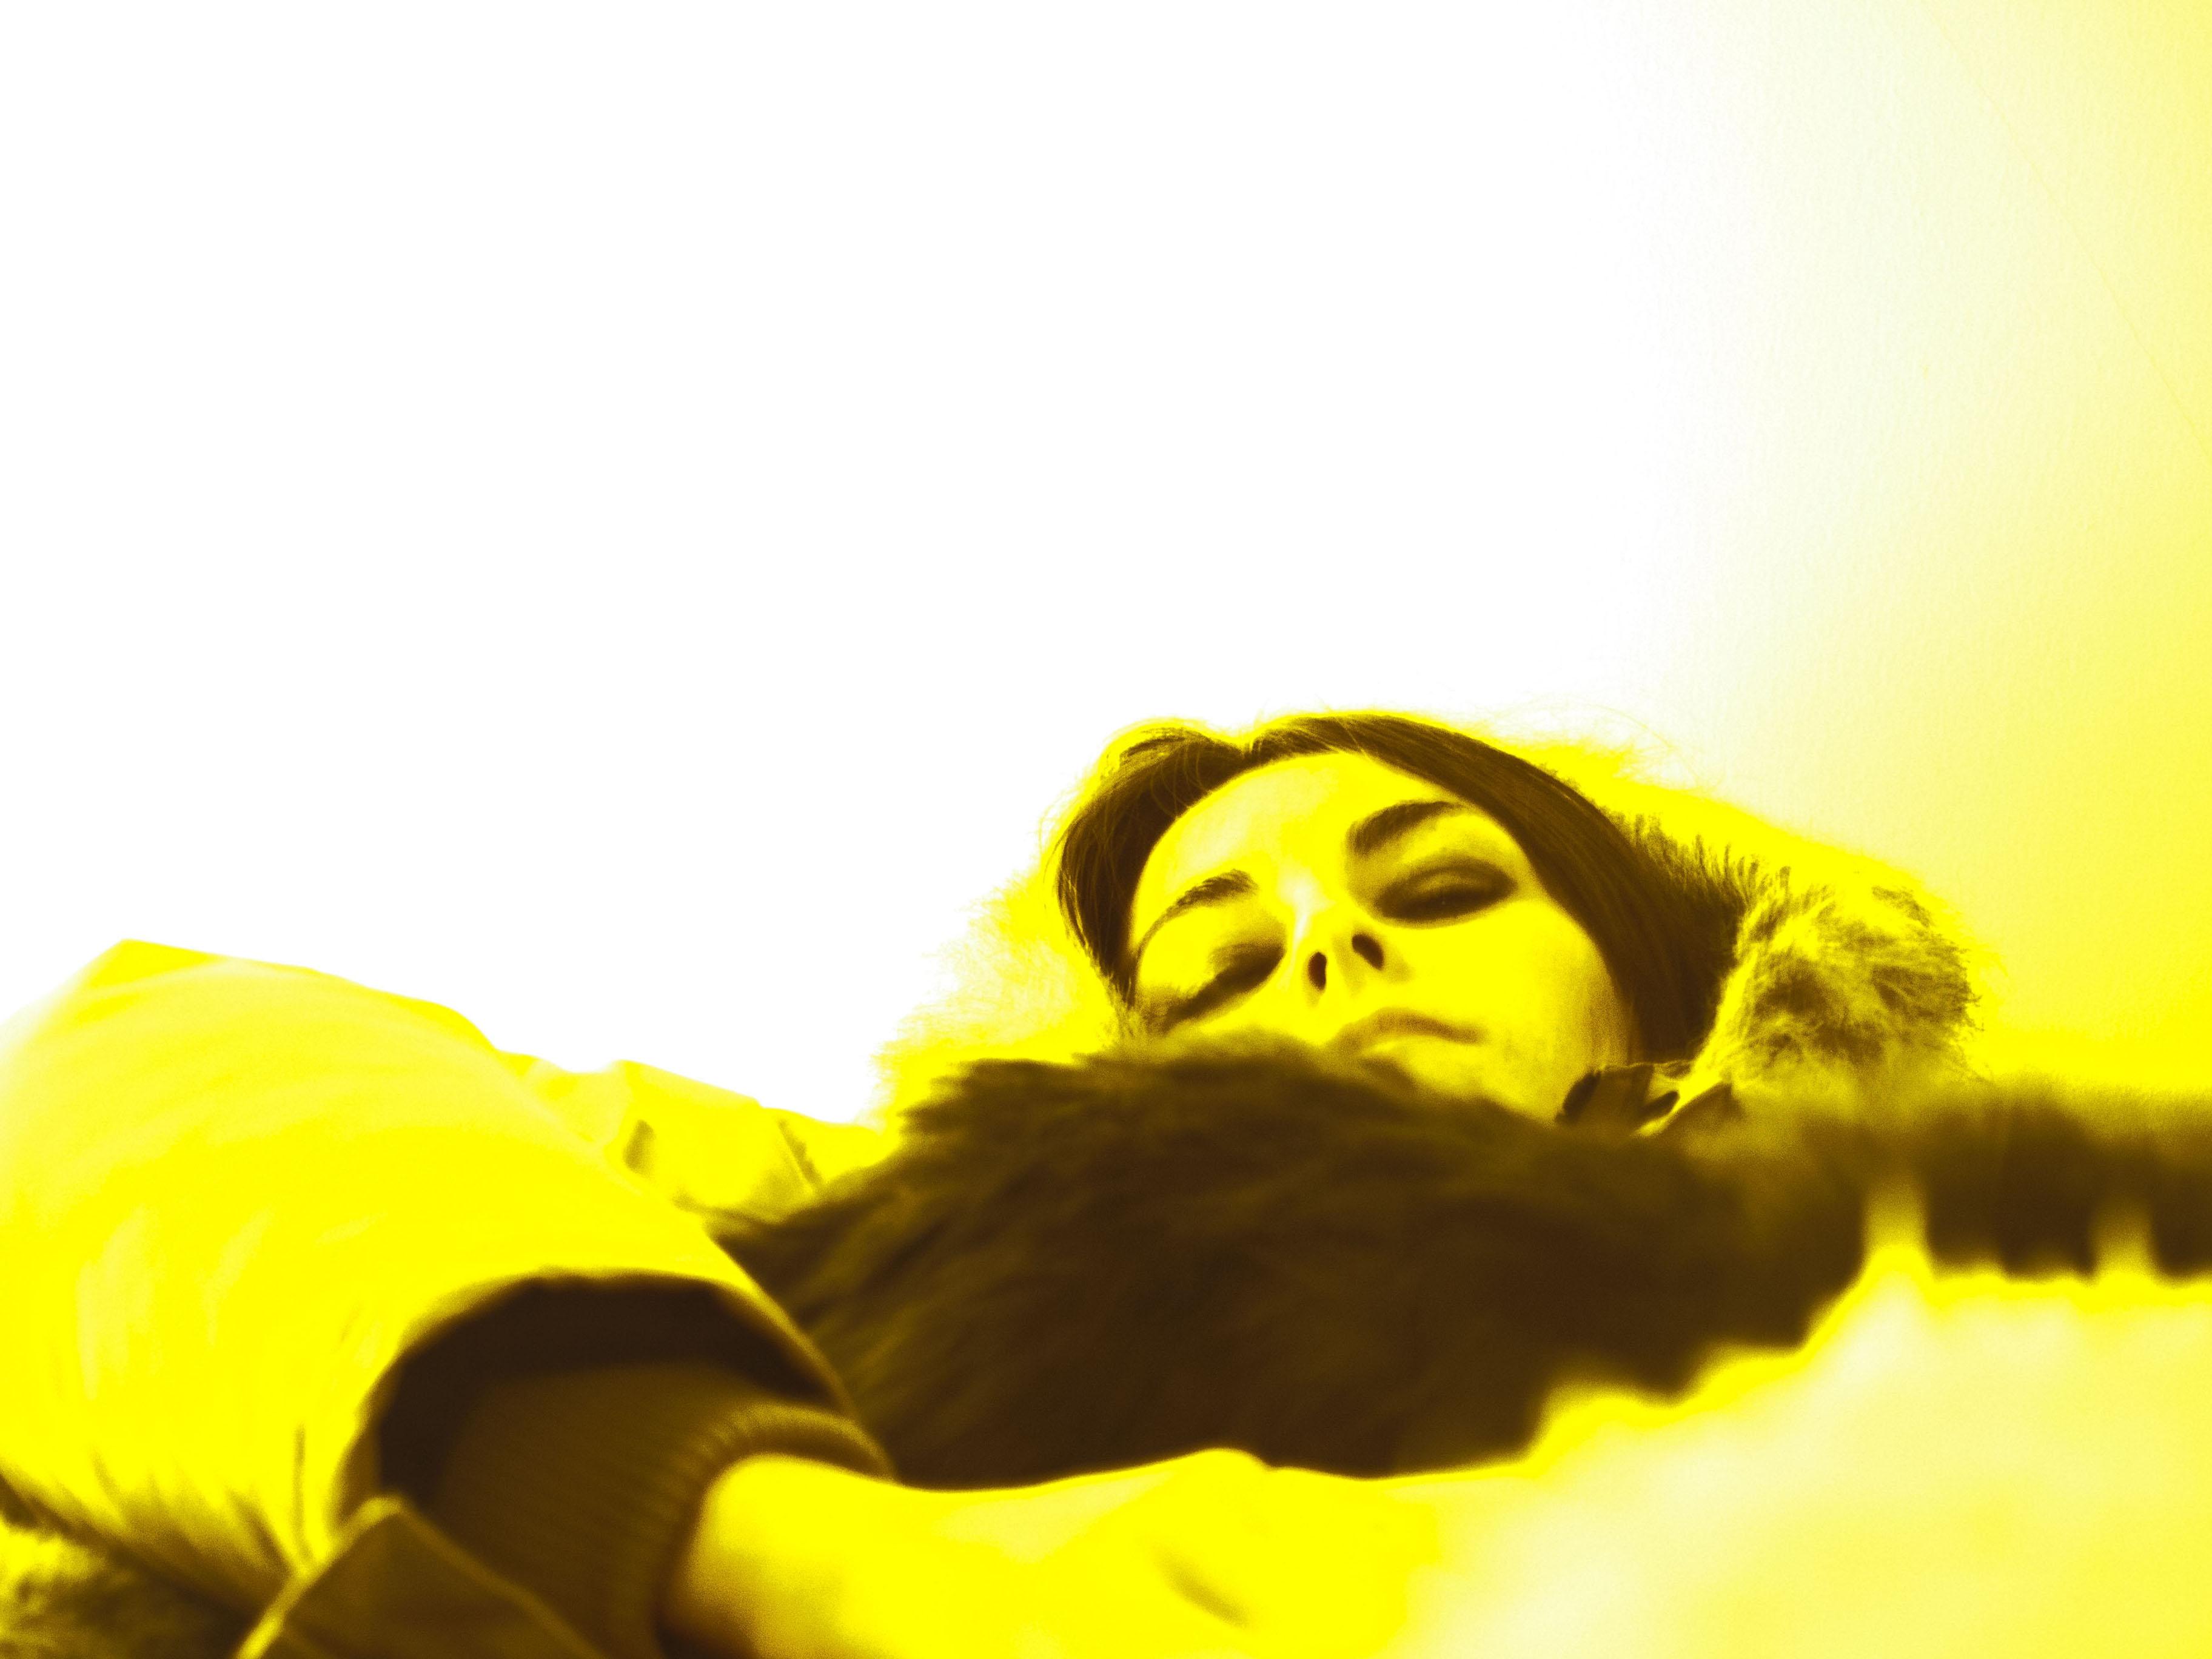 resting her eyes-2013